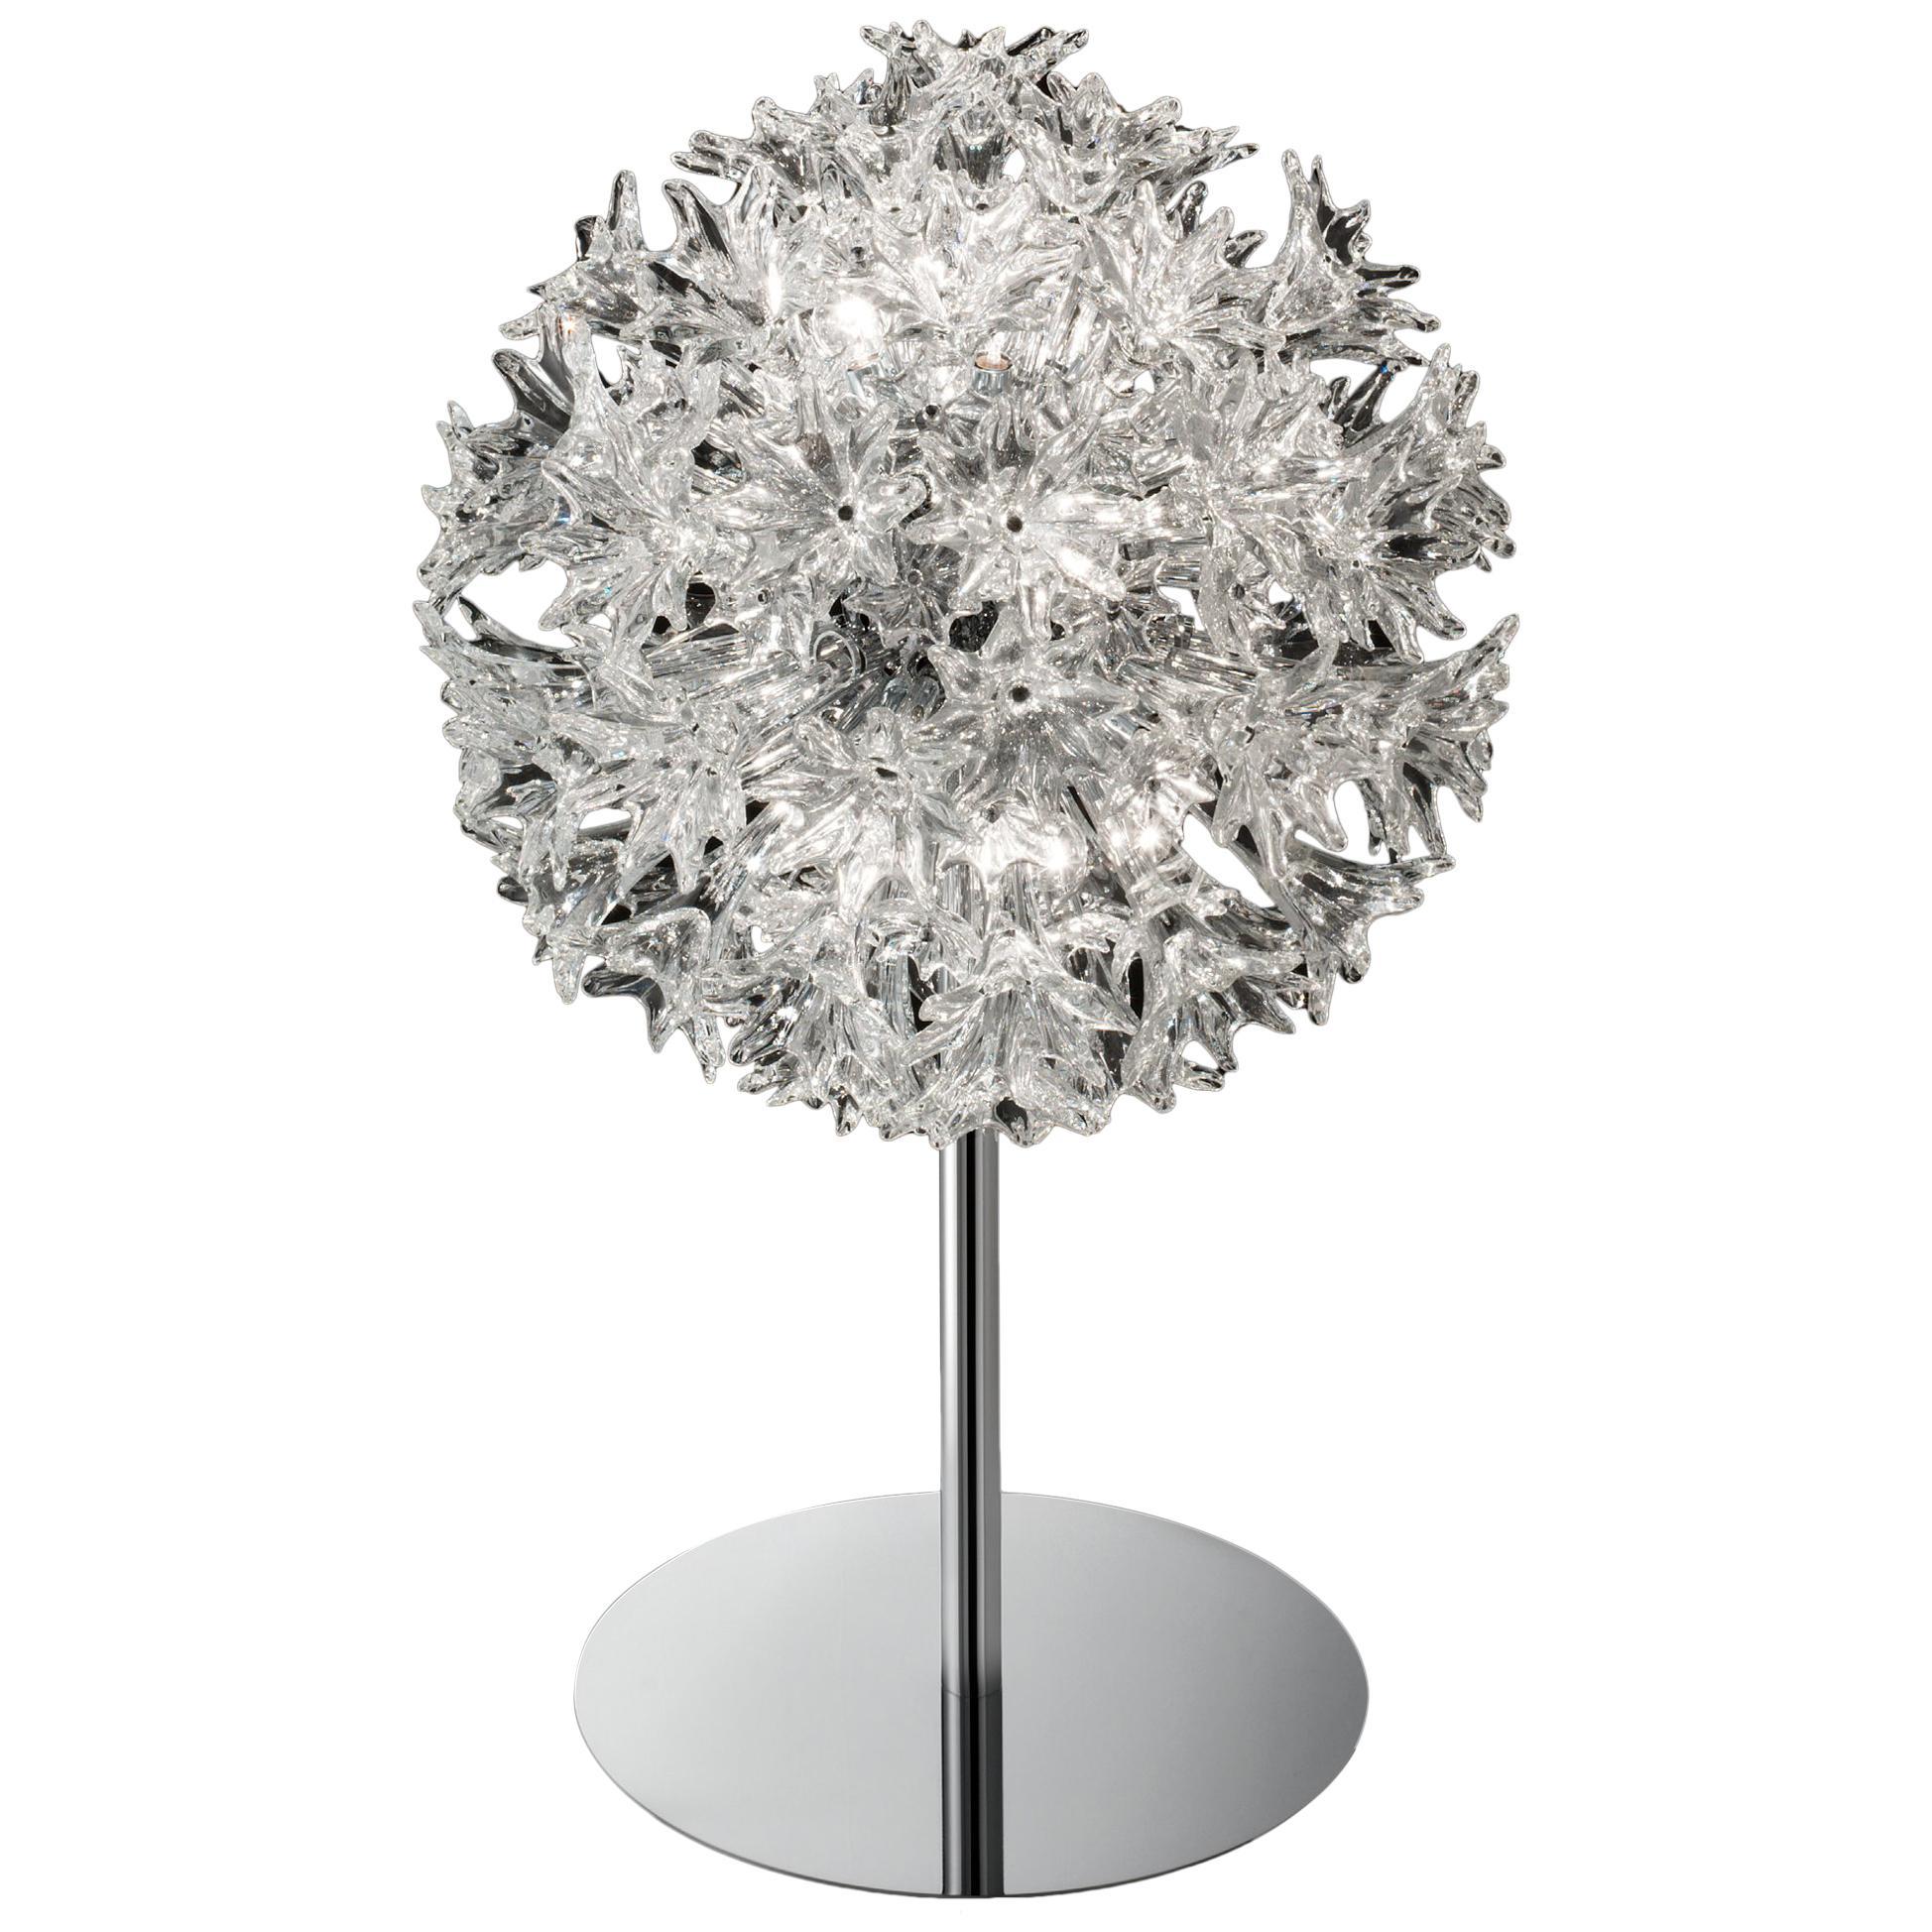 Venini Esprit Table Lamp in Crystal